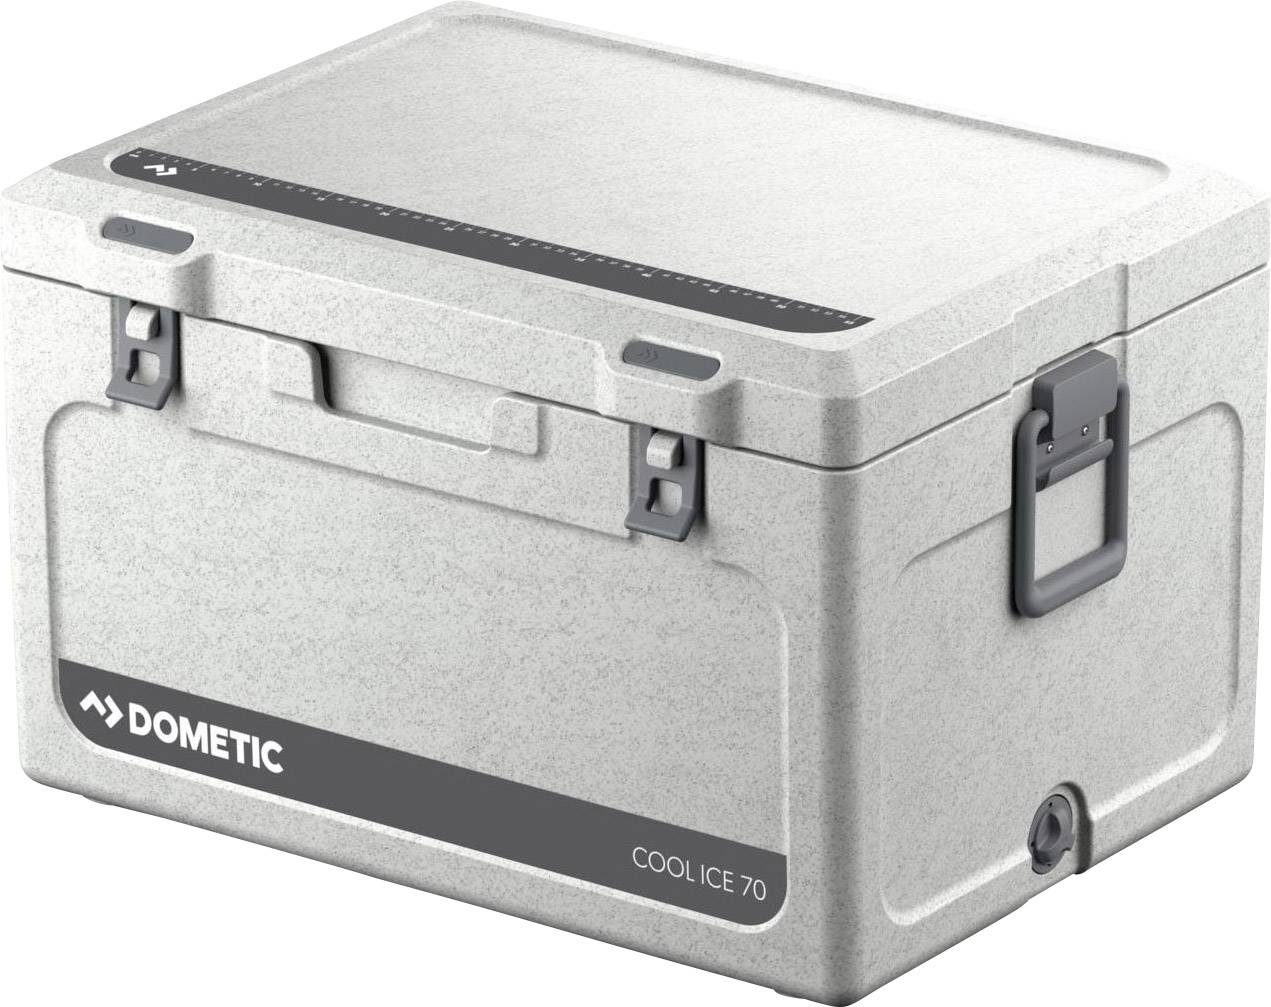 Dometic Mini Kühlschrank : Dometic group dometic cool ice ci kühlbox passiv grau schwarz